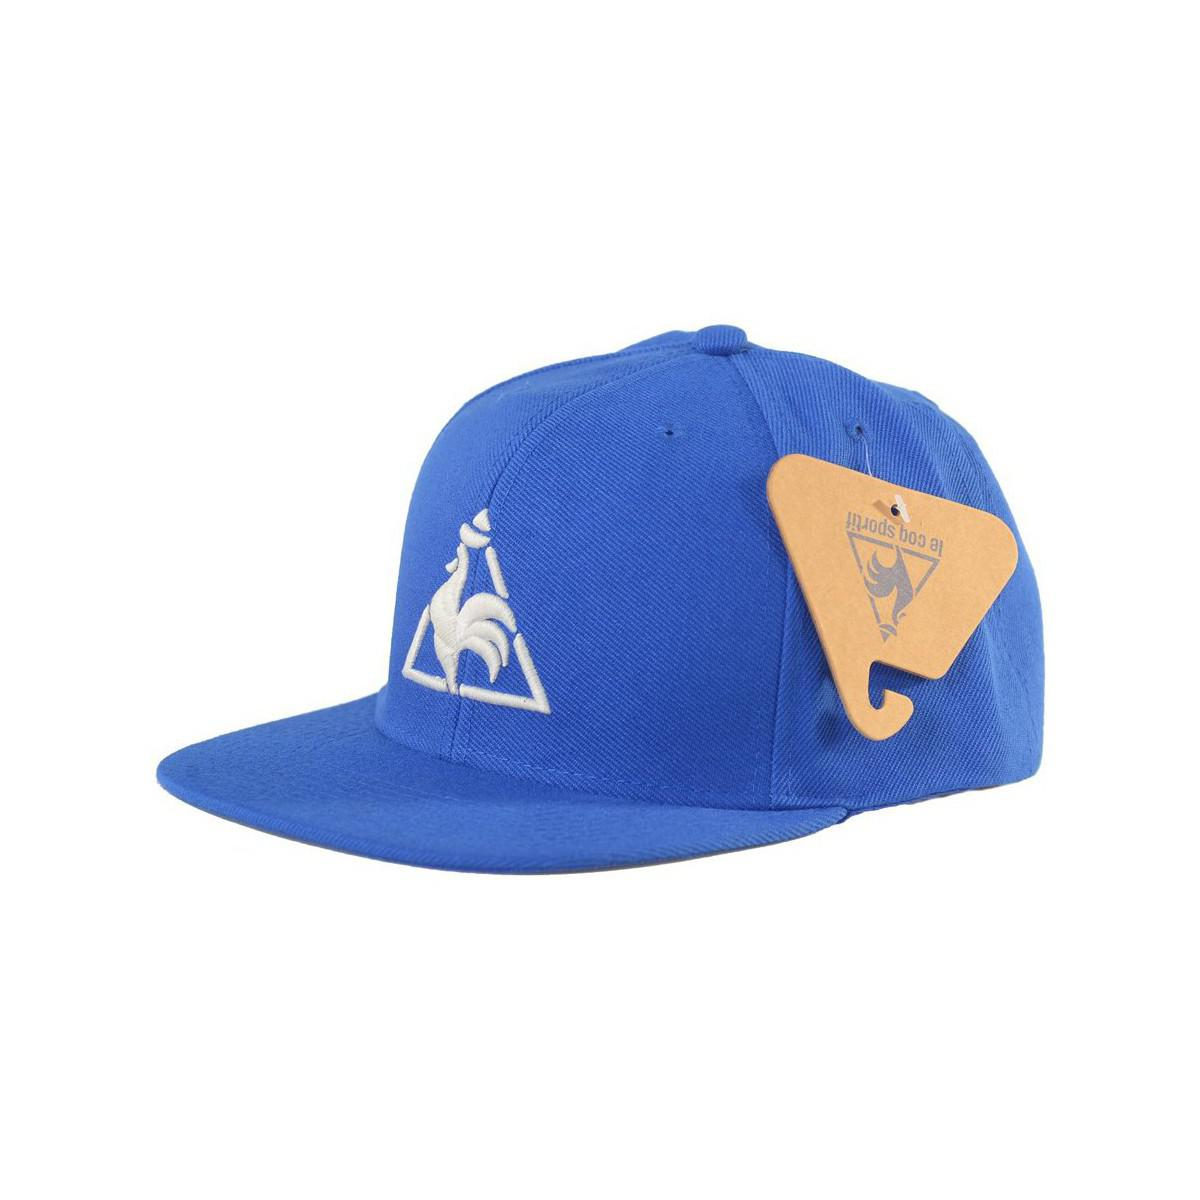 987b2b99bd147 Le coq sportif small accessories snapback cap royal womens shoes jpg  1200x1200 Royal blue accessories for